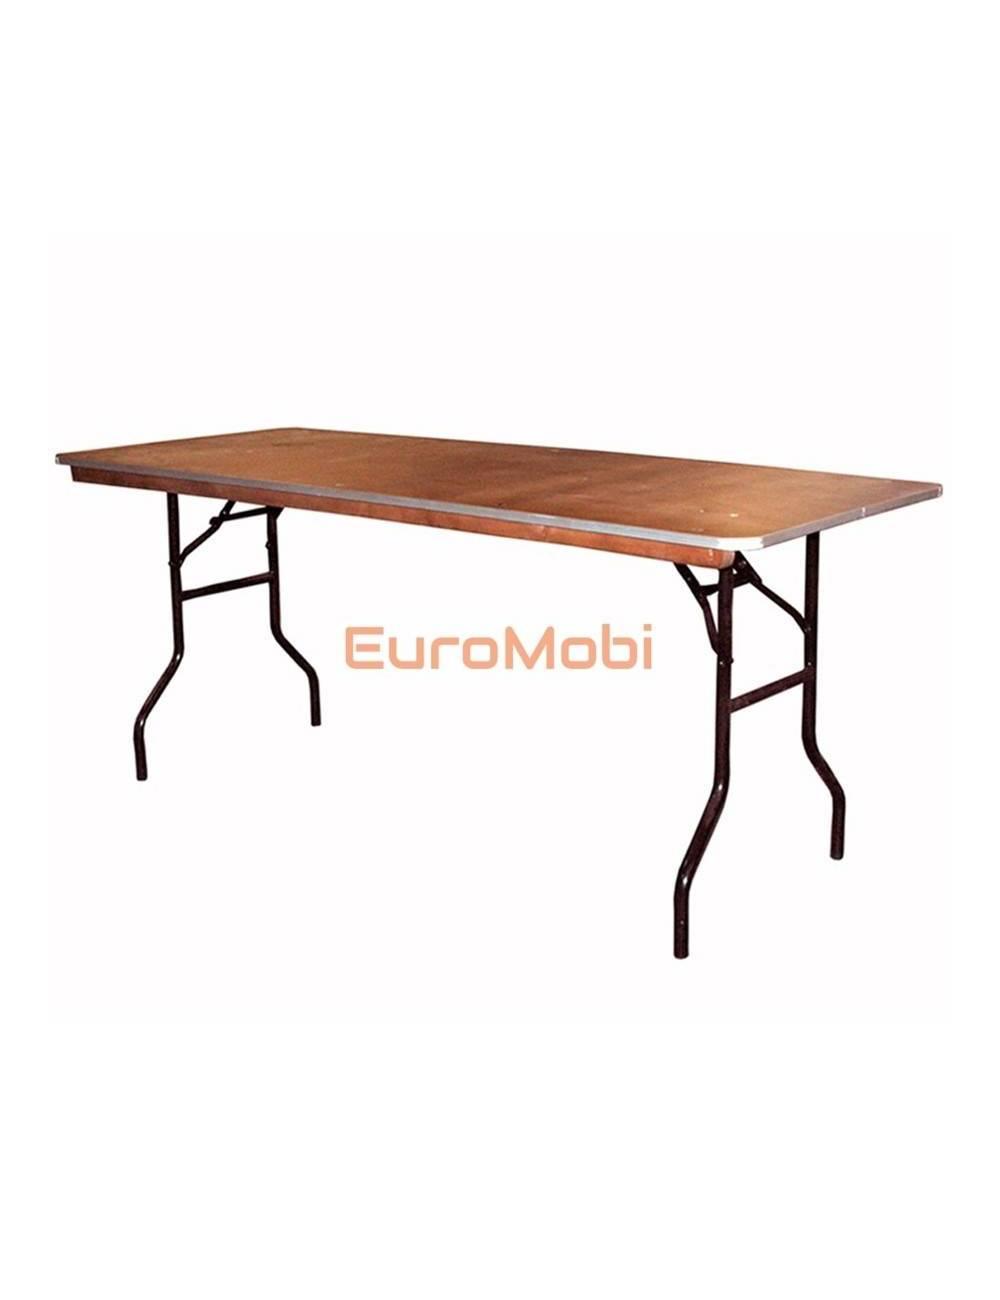 Tacoma folding table rectangular 183 x 76cm open